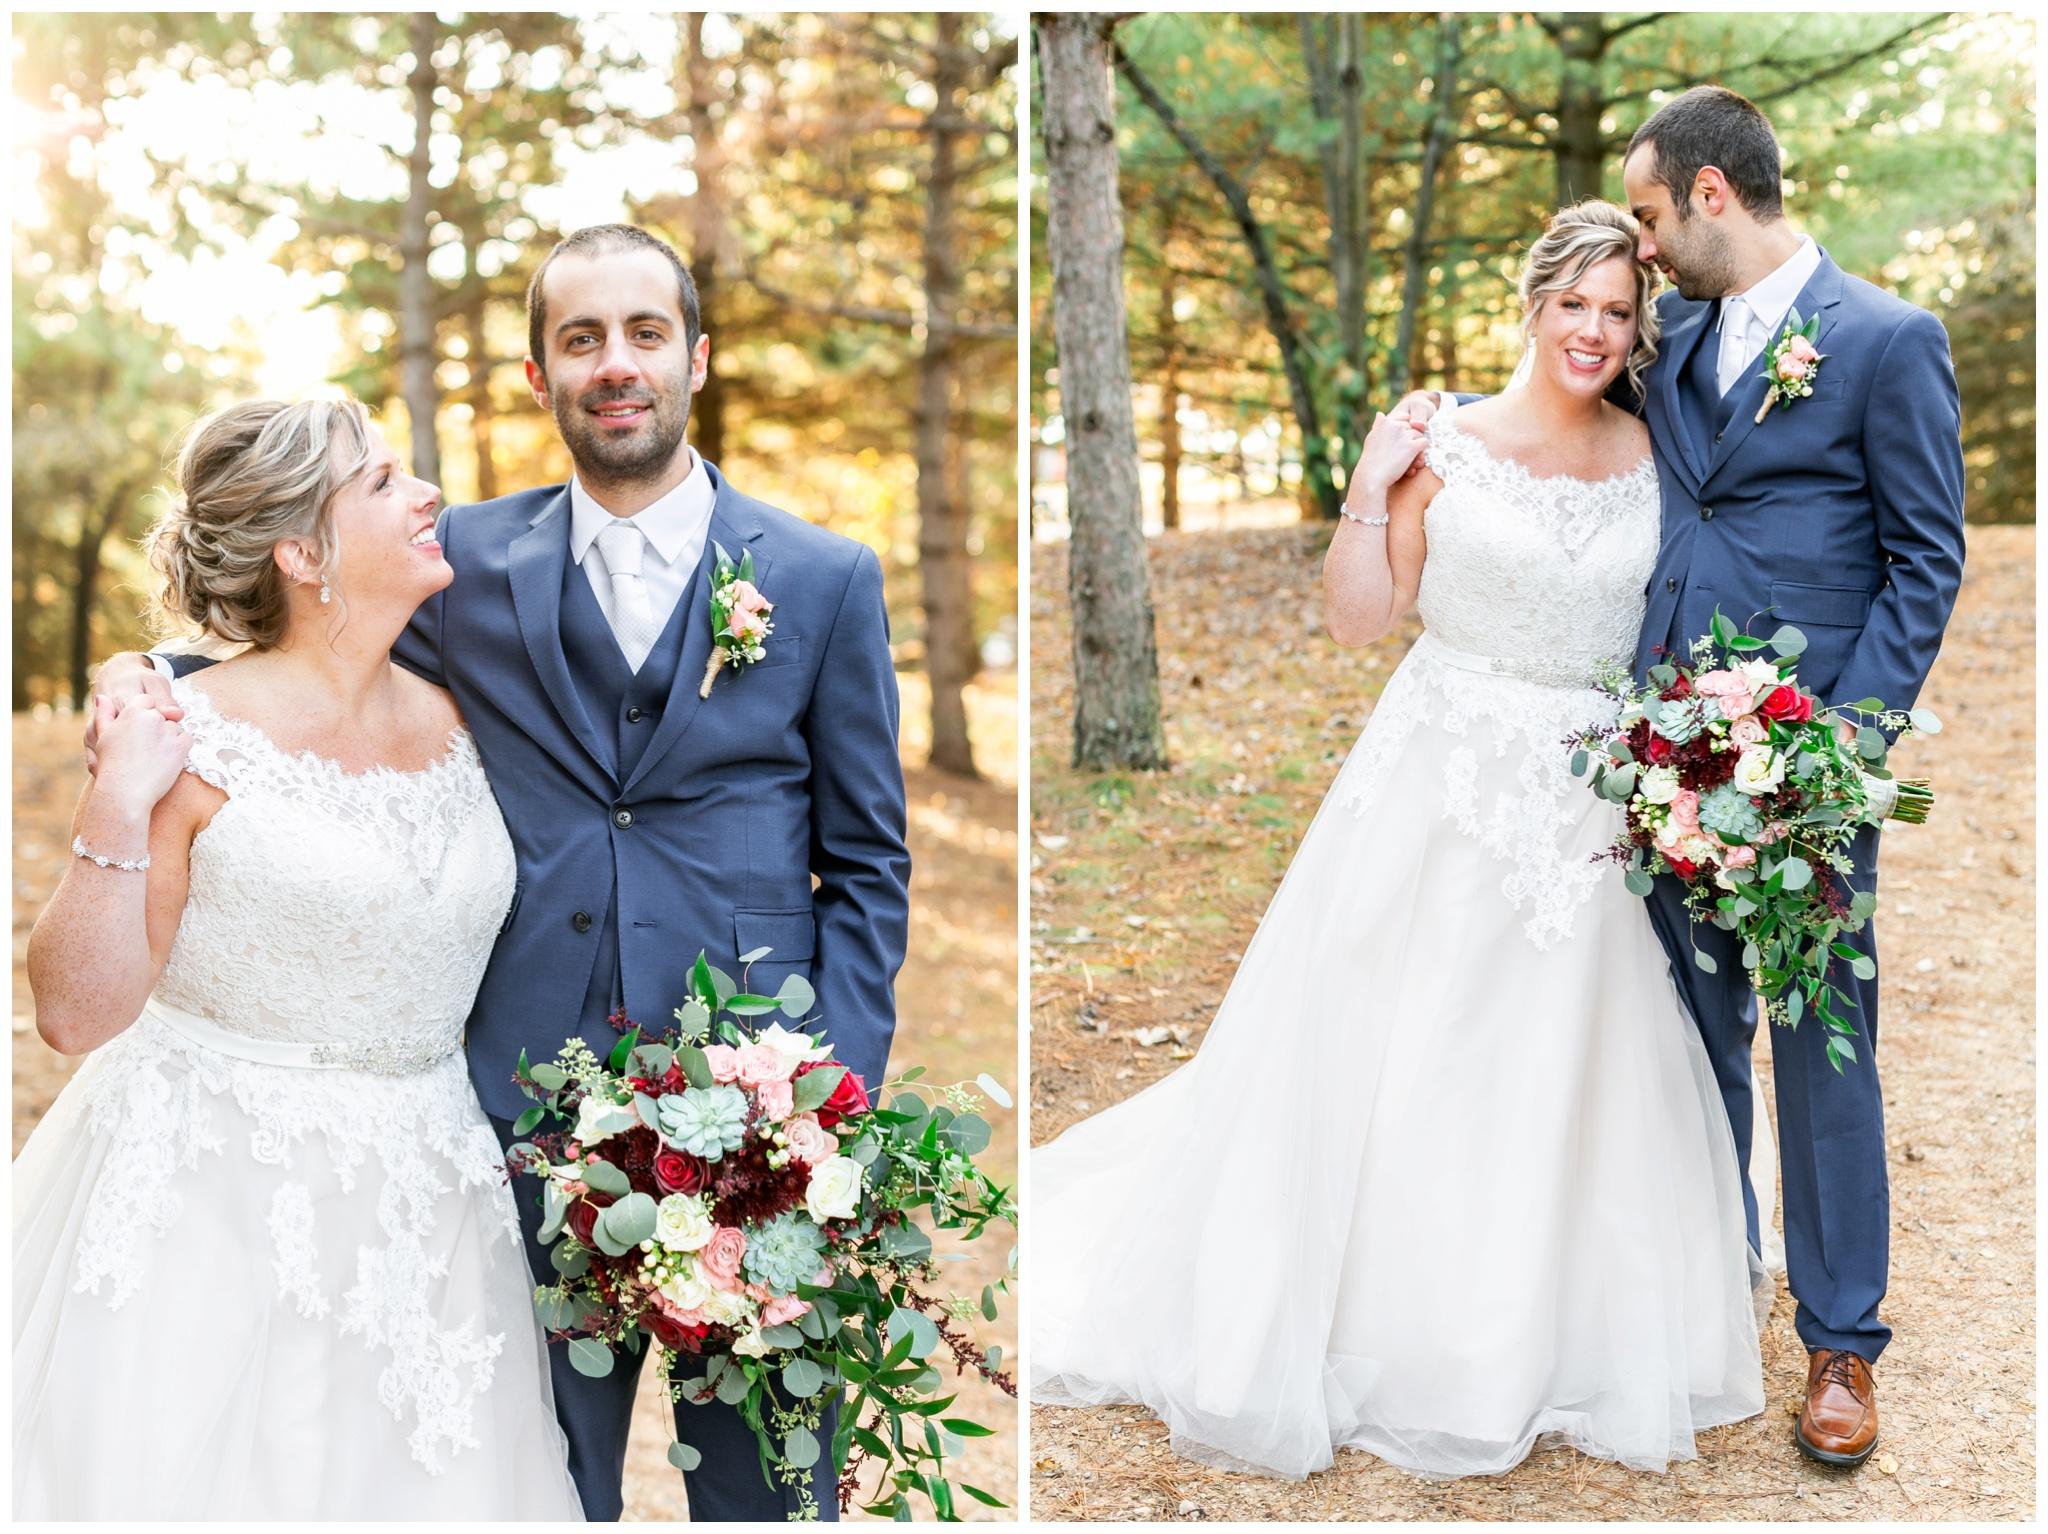 Shawano_County_park_Wedding_Caynay_Photo_Madison_Wi_2320.jpg